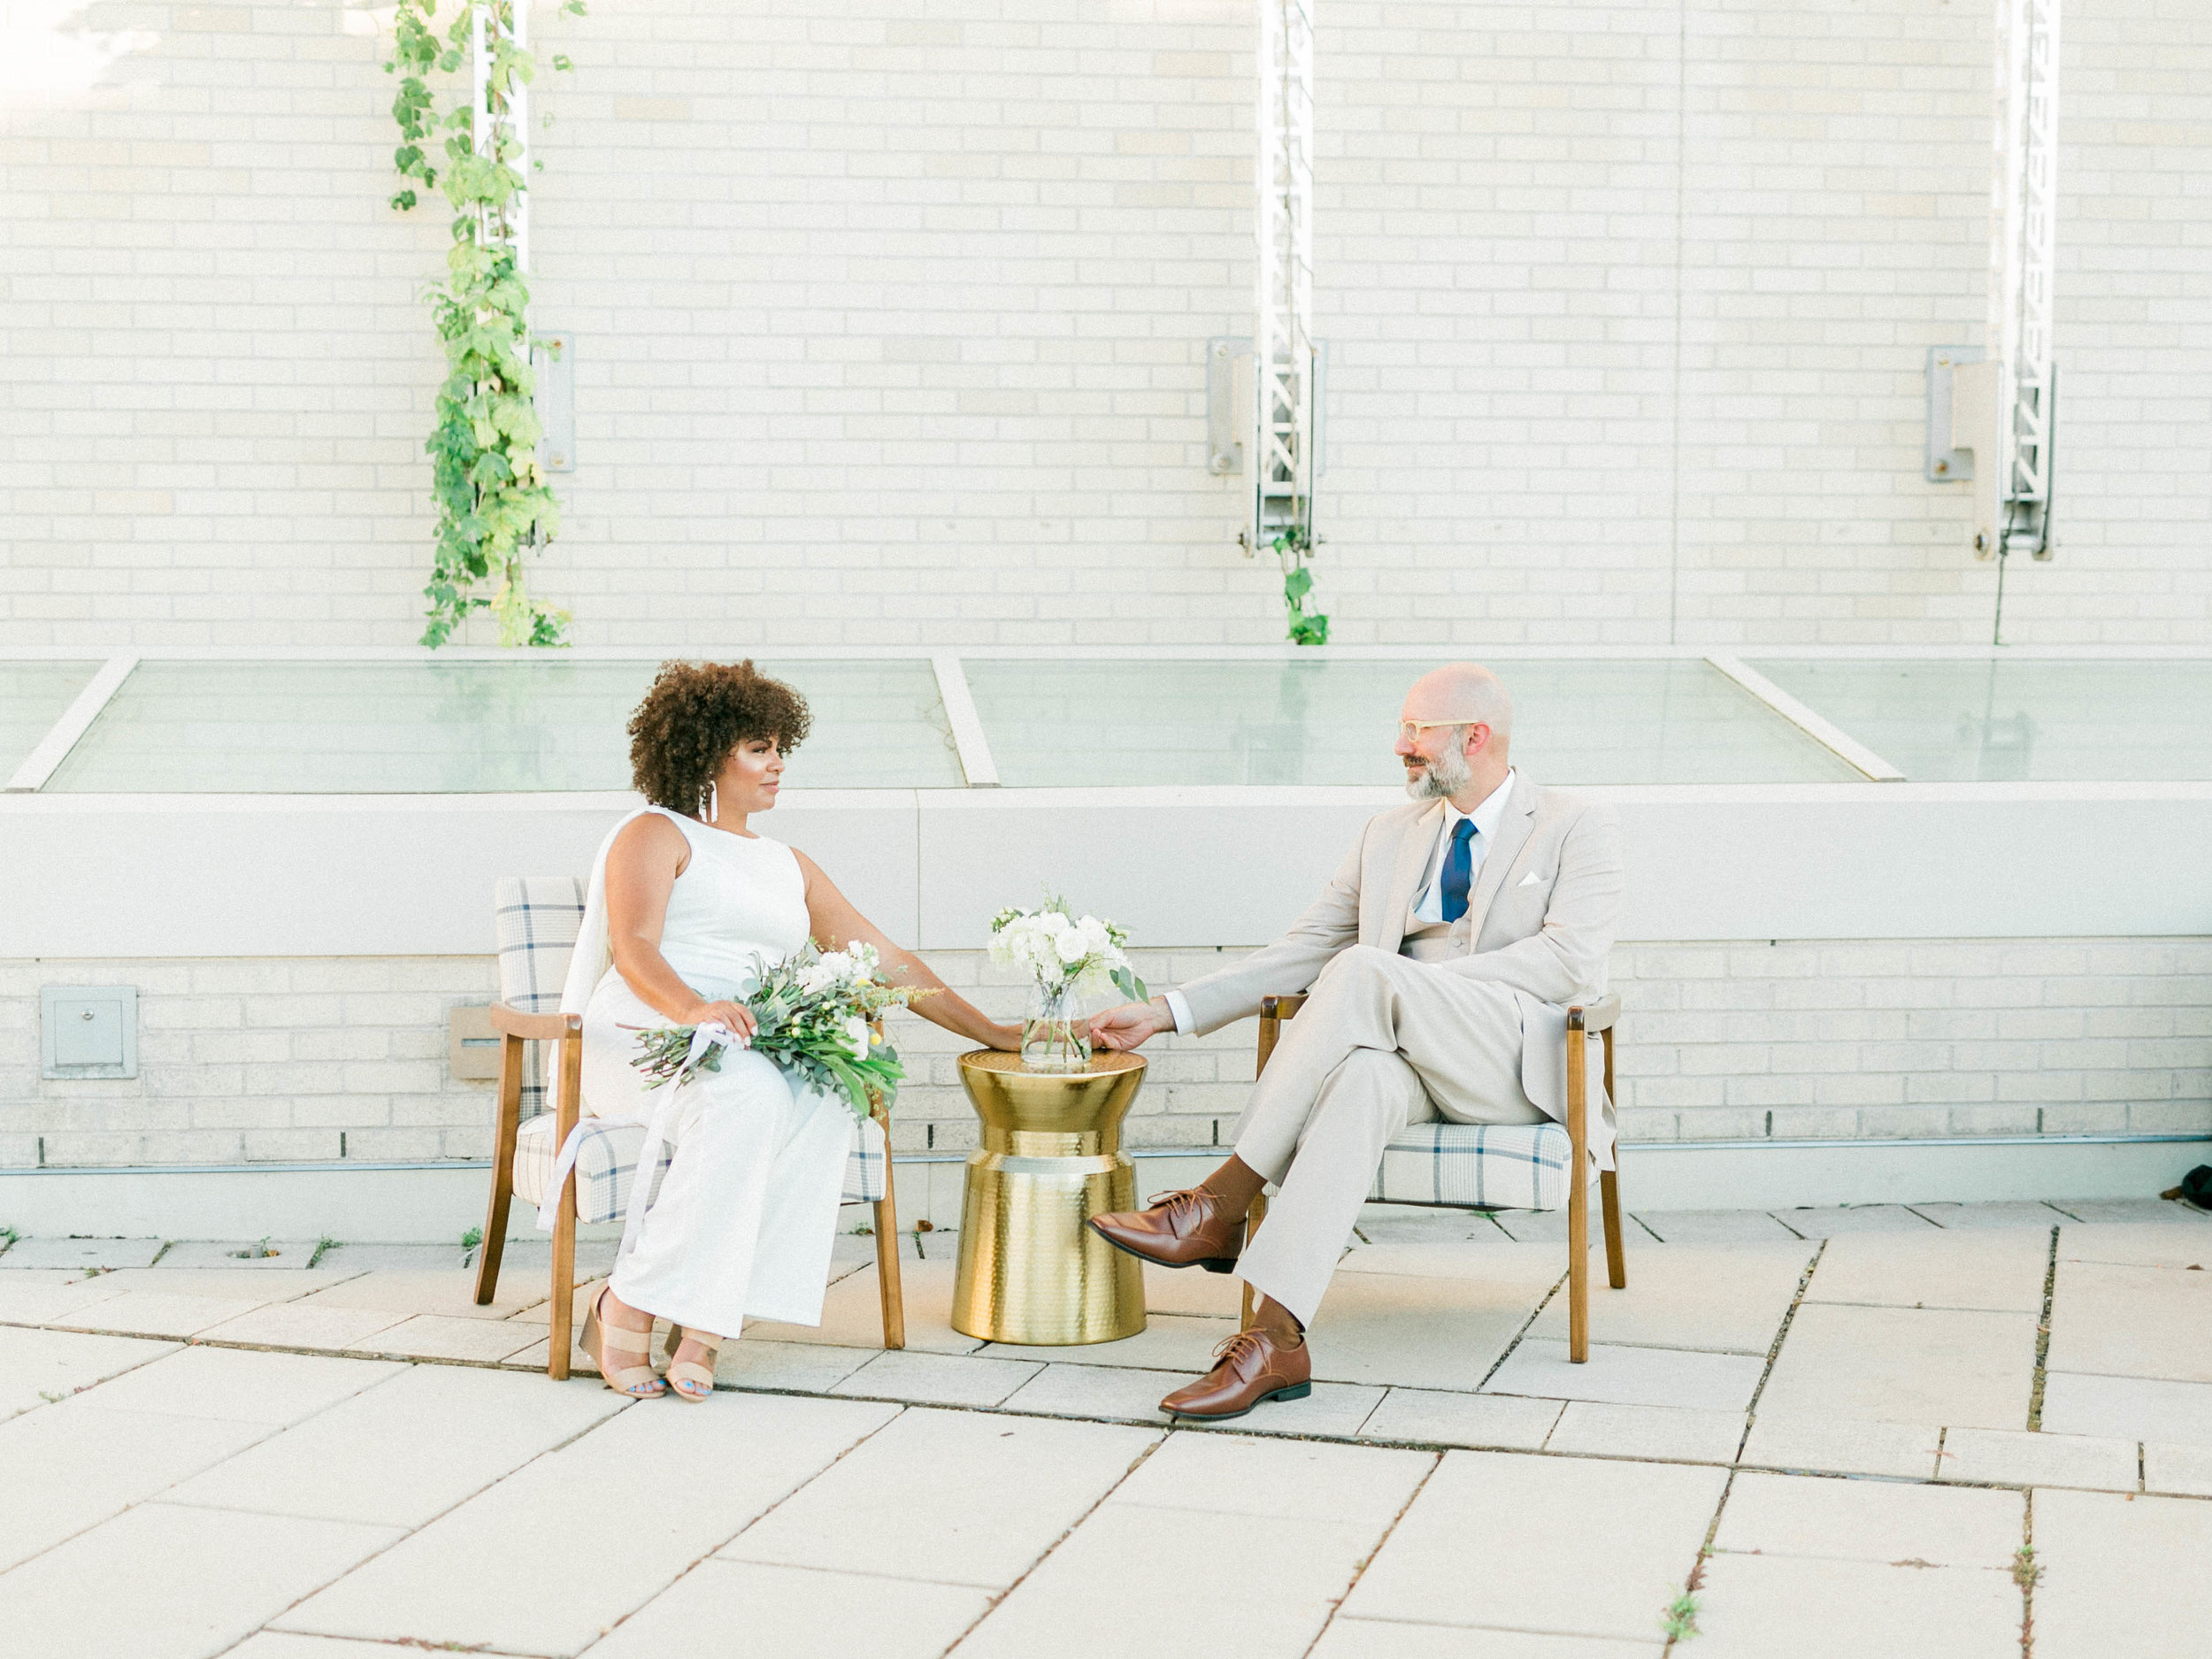 1960s-Contemporary Style Wedding